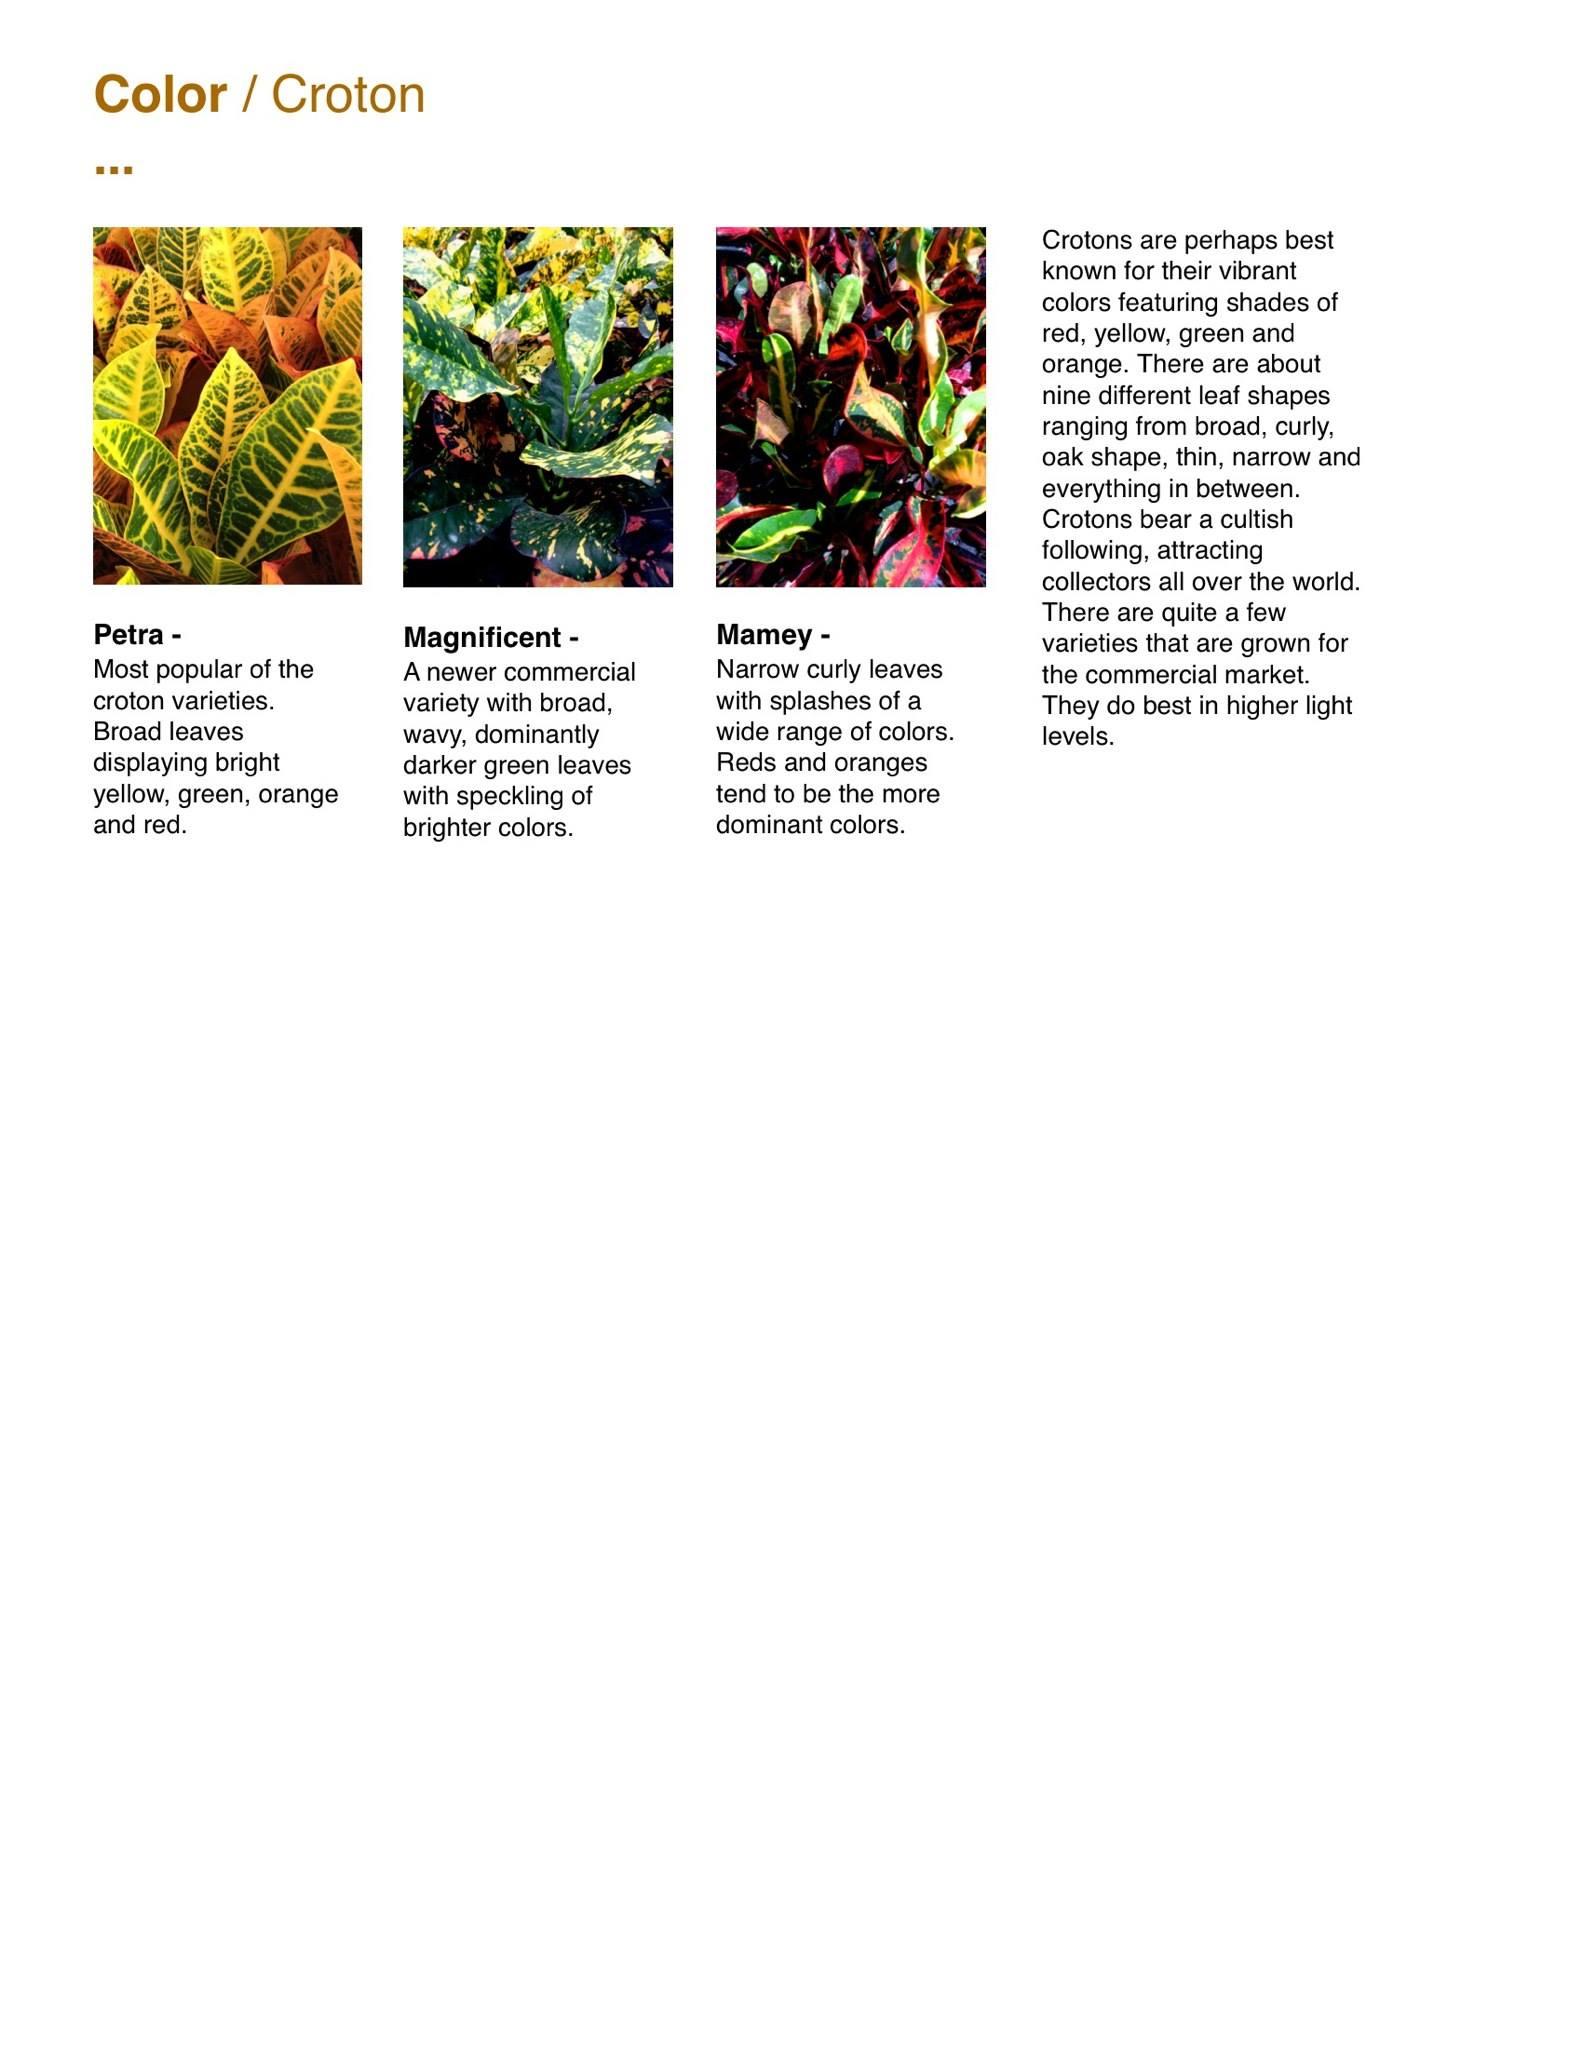 Capri Farms Slideshow - Page 32